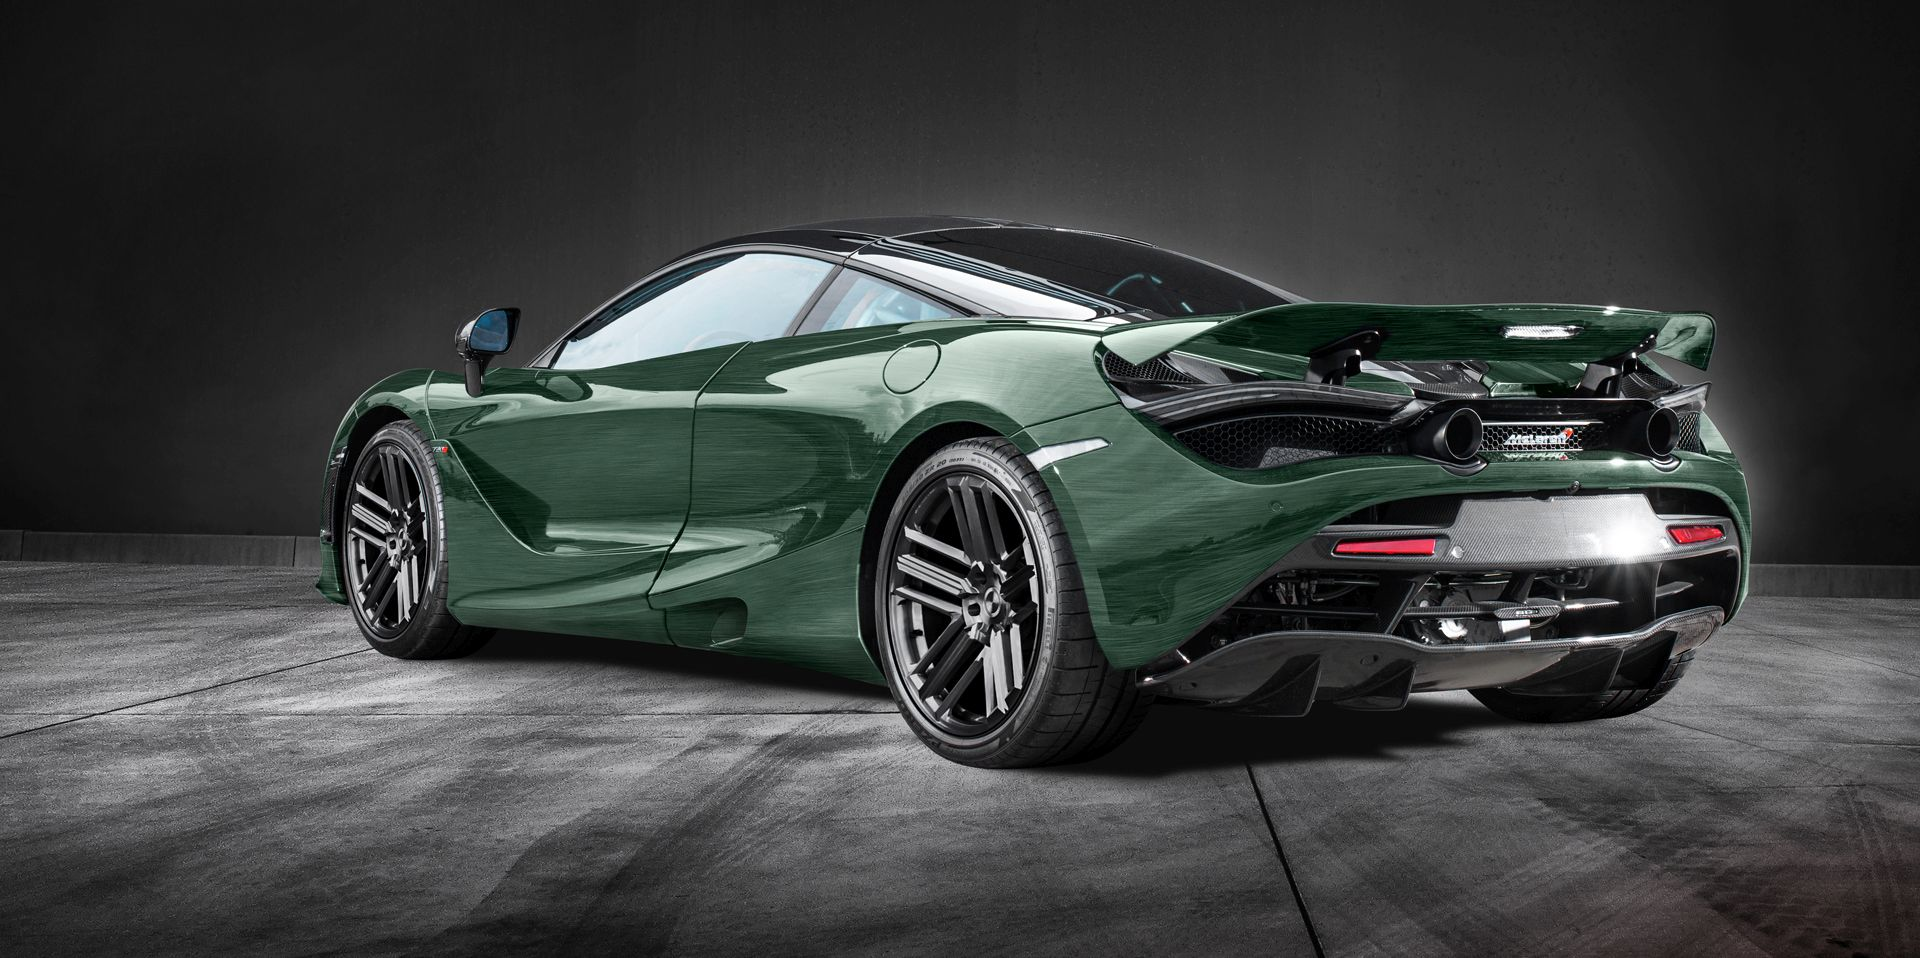 McLaren-720S-by-Carlex-Design-2